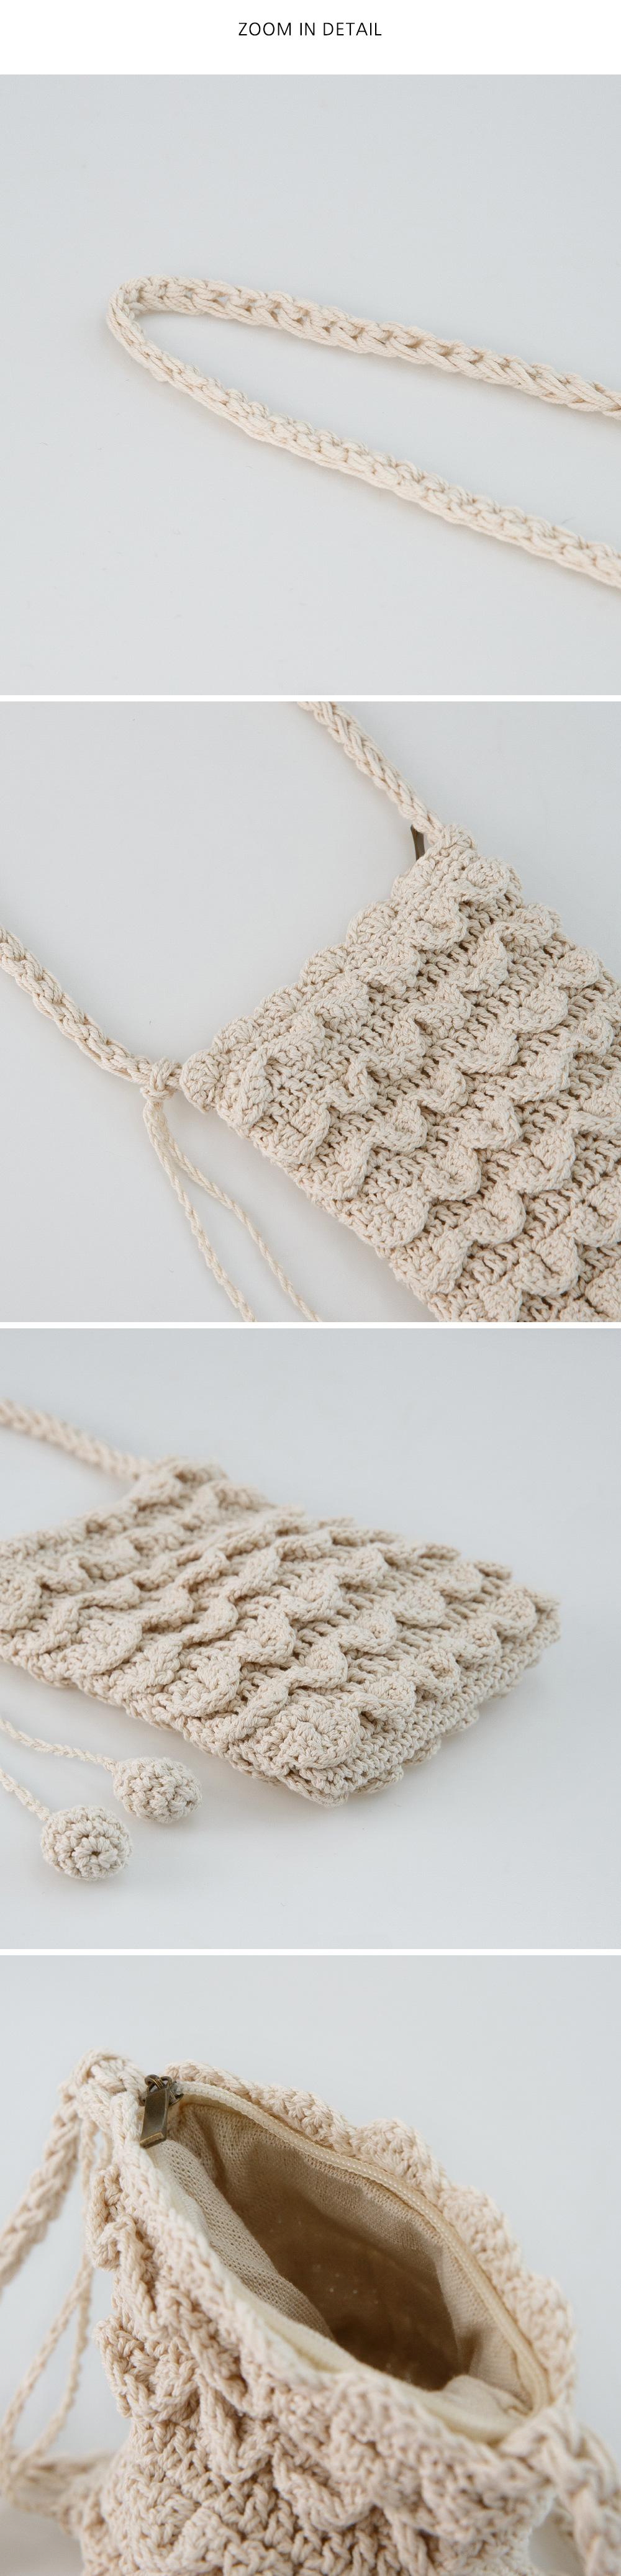 minimal knit cross bag